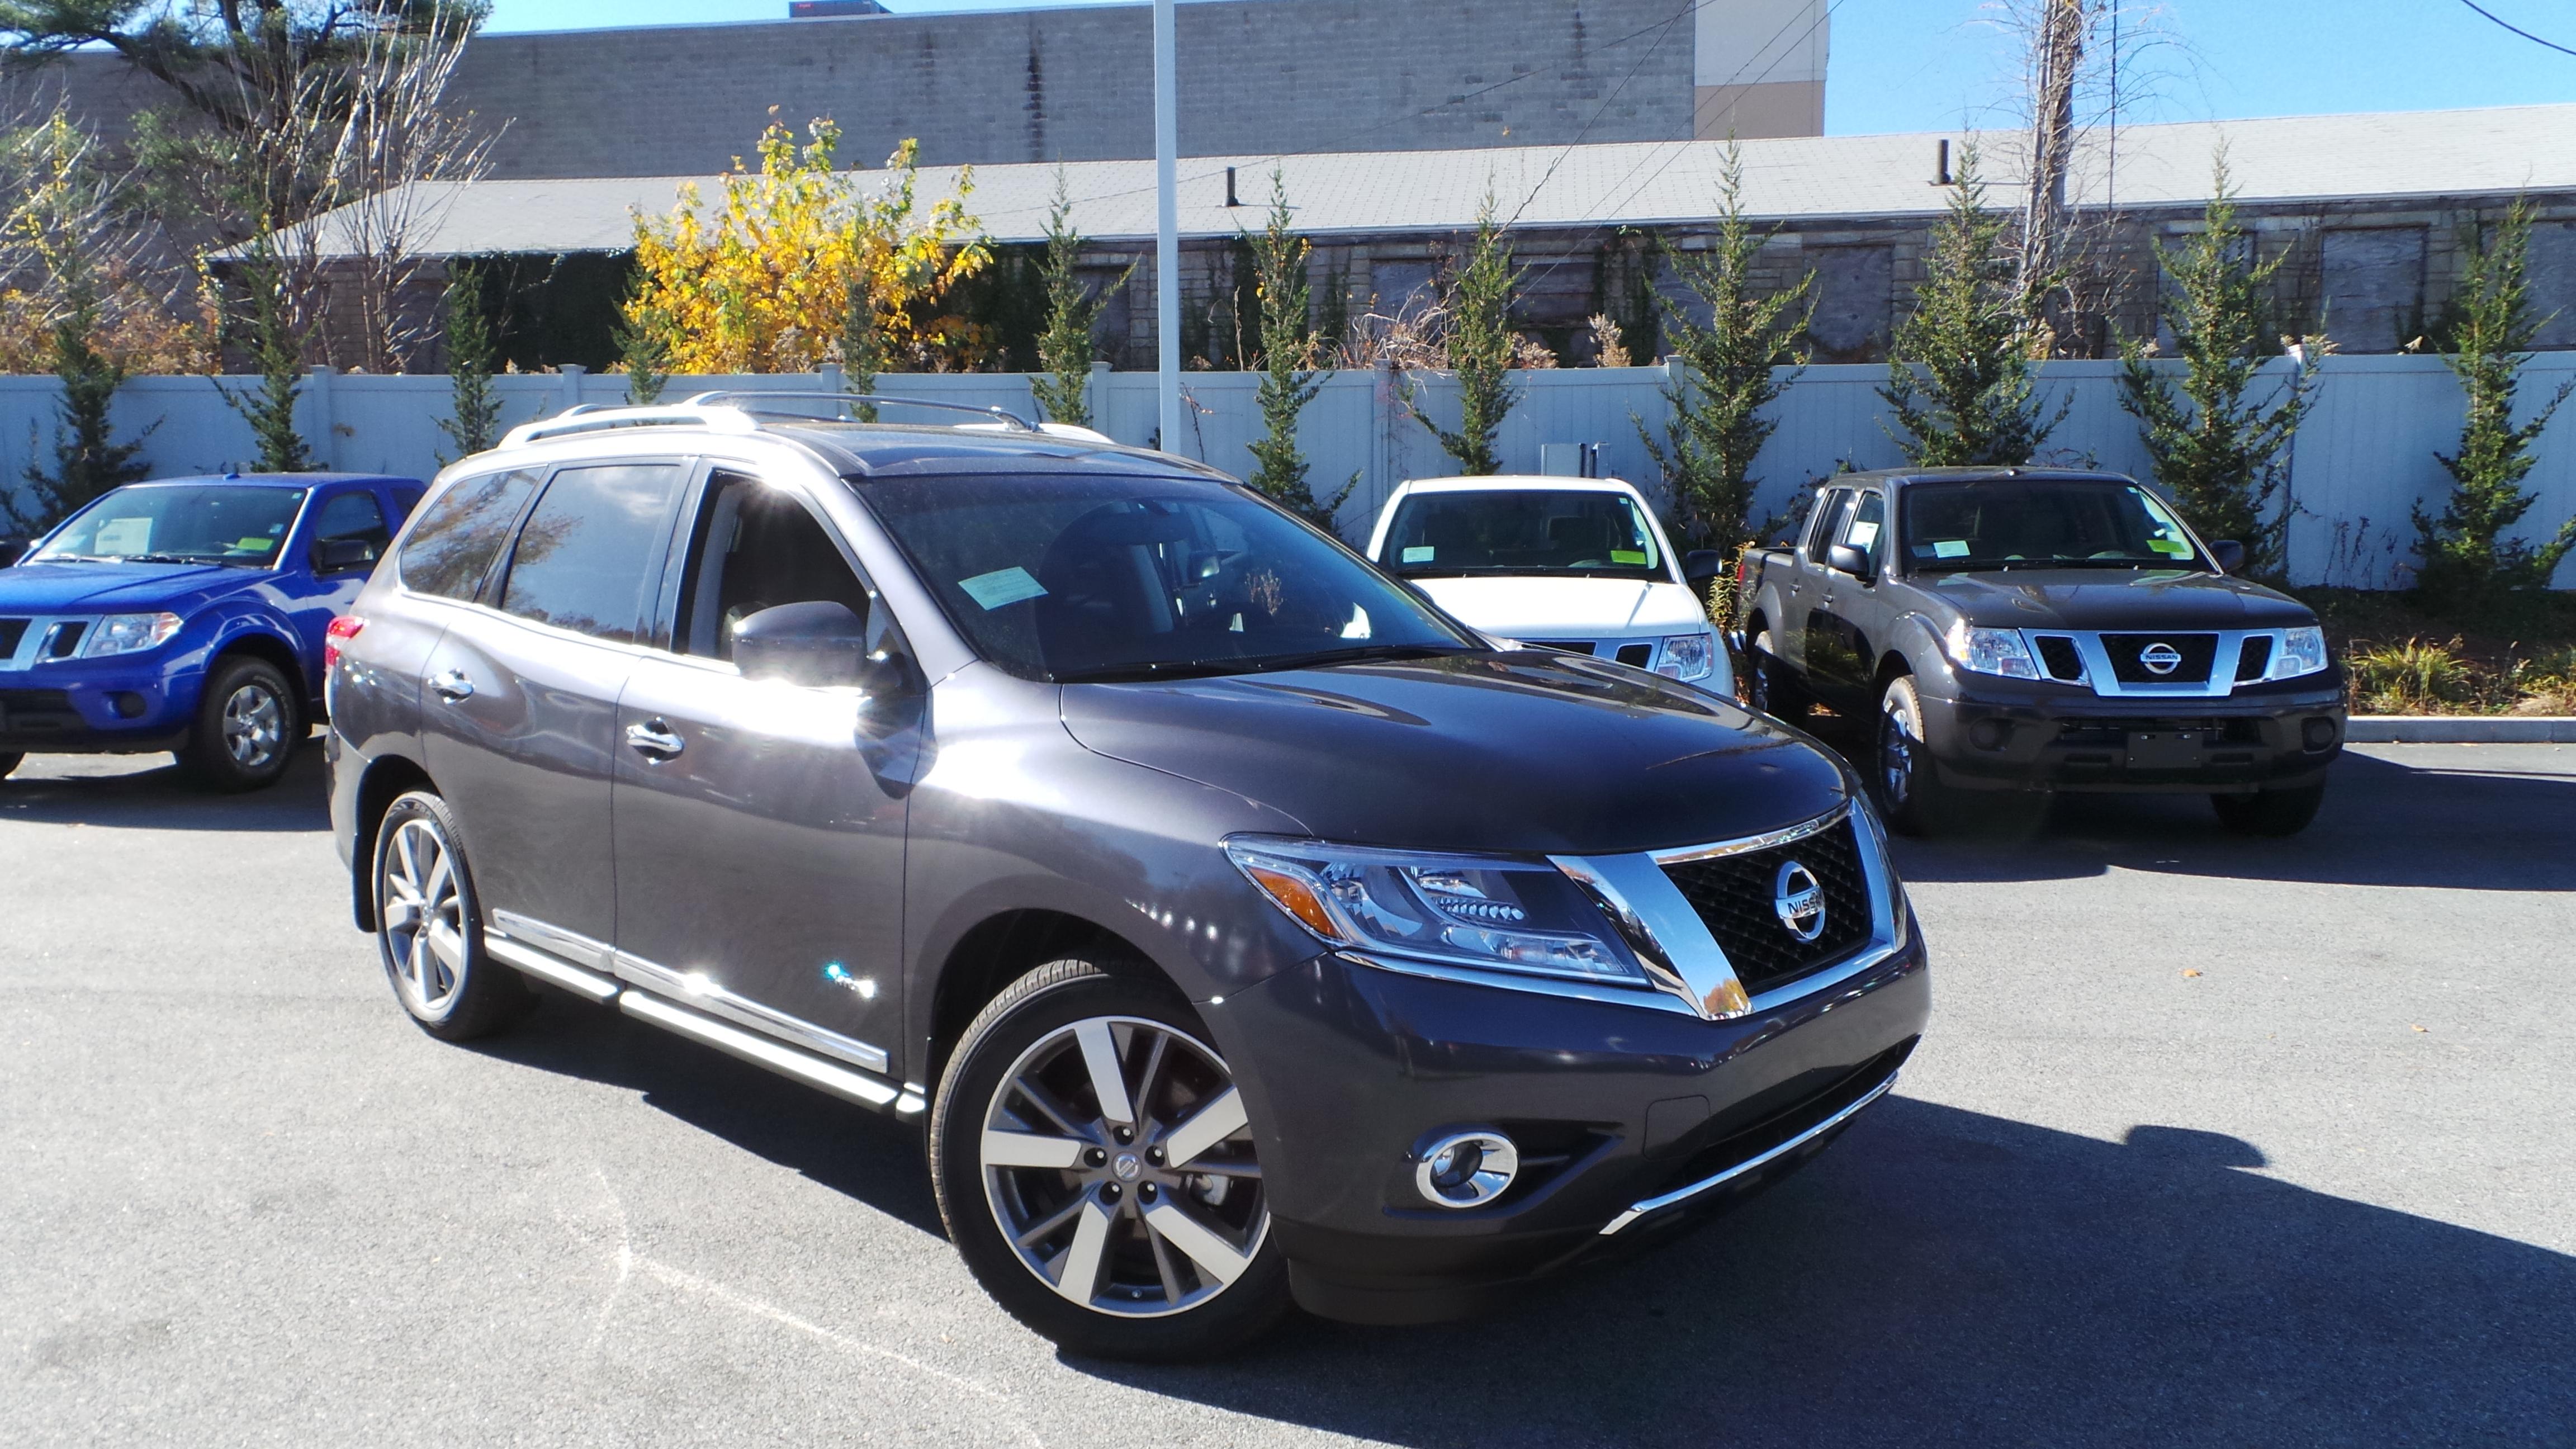 2014 Nissan Pathfinder Hybrid is here